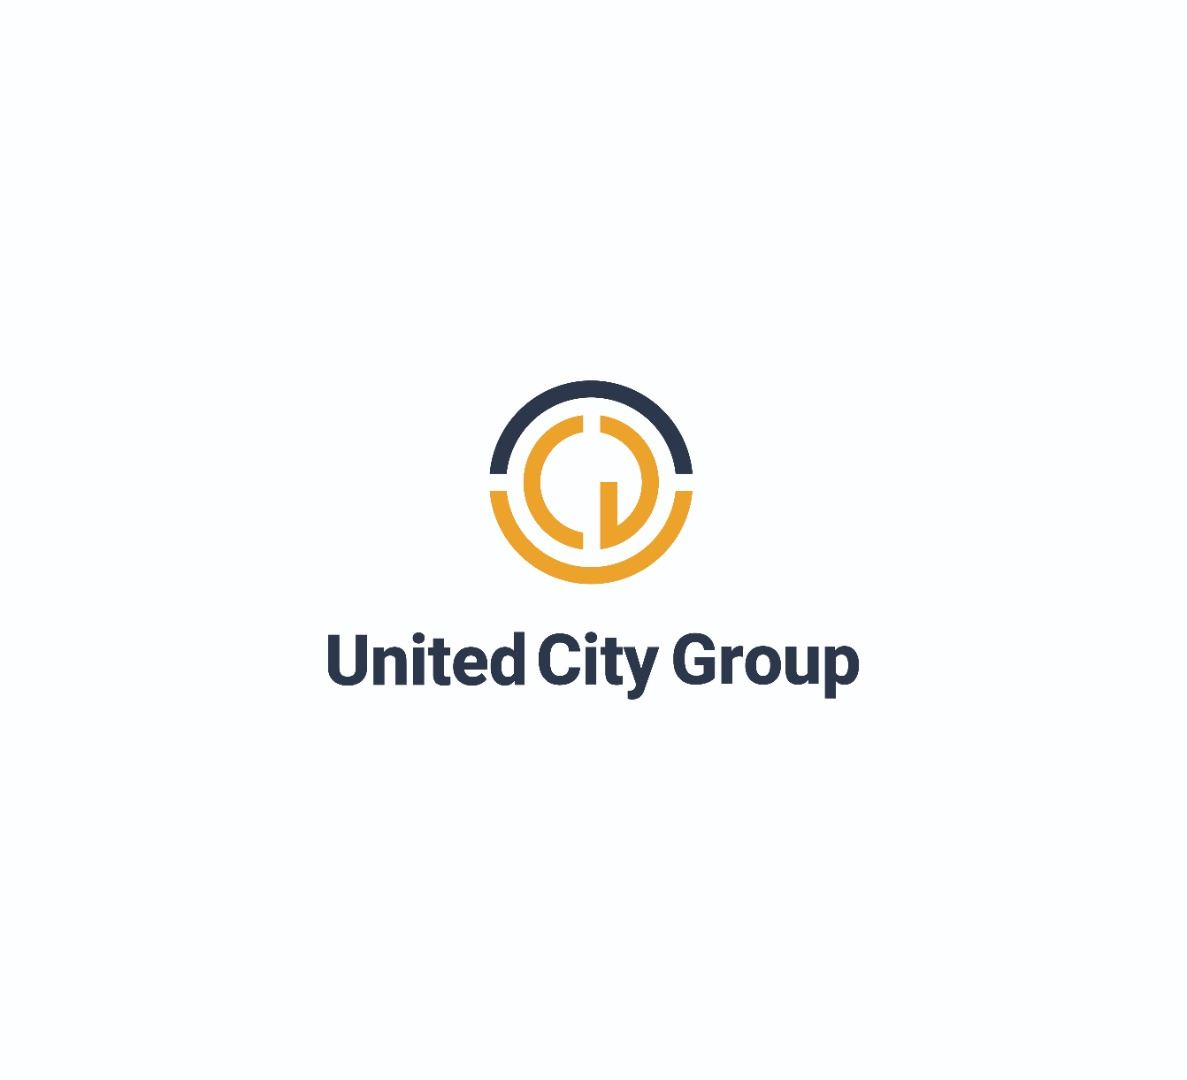 UCG-logo-positive_thumb.jpg